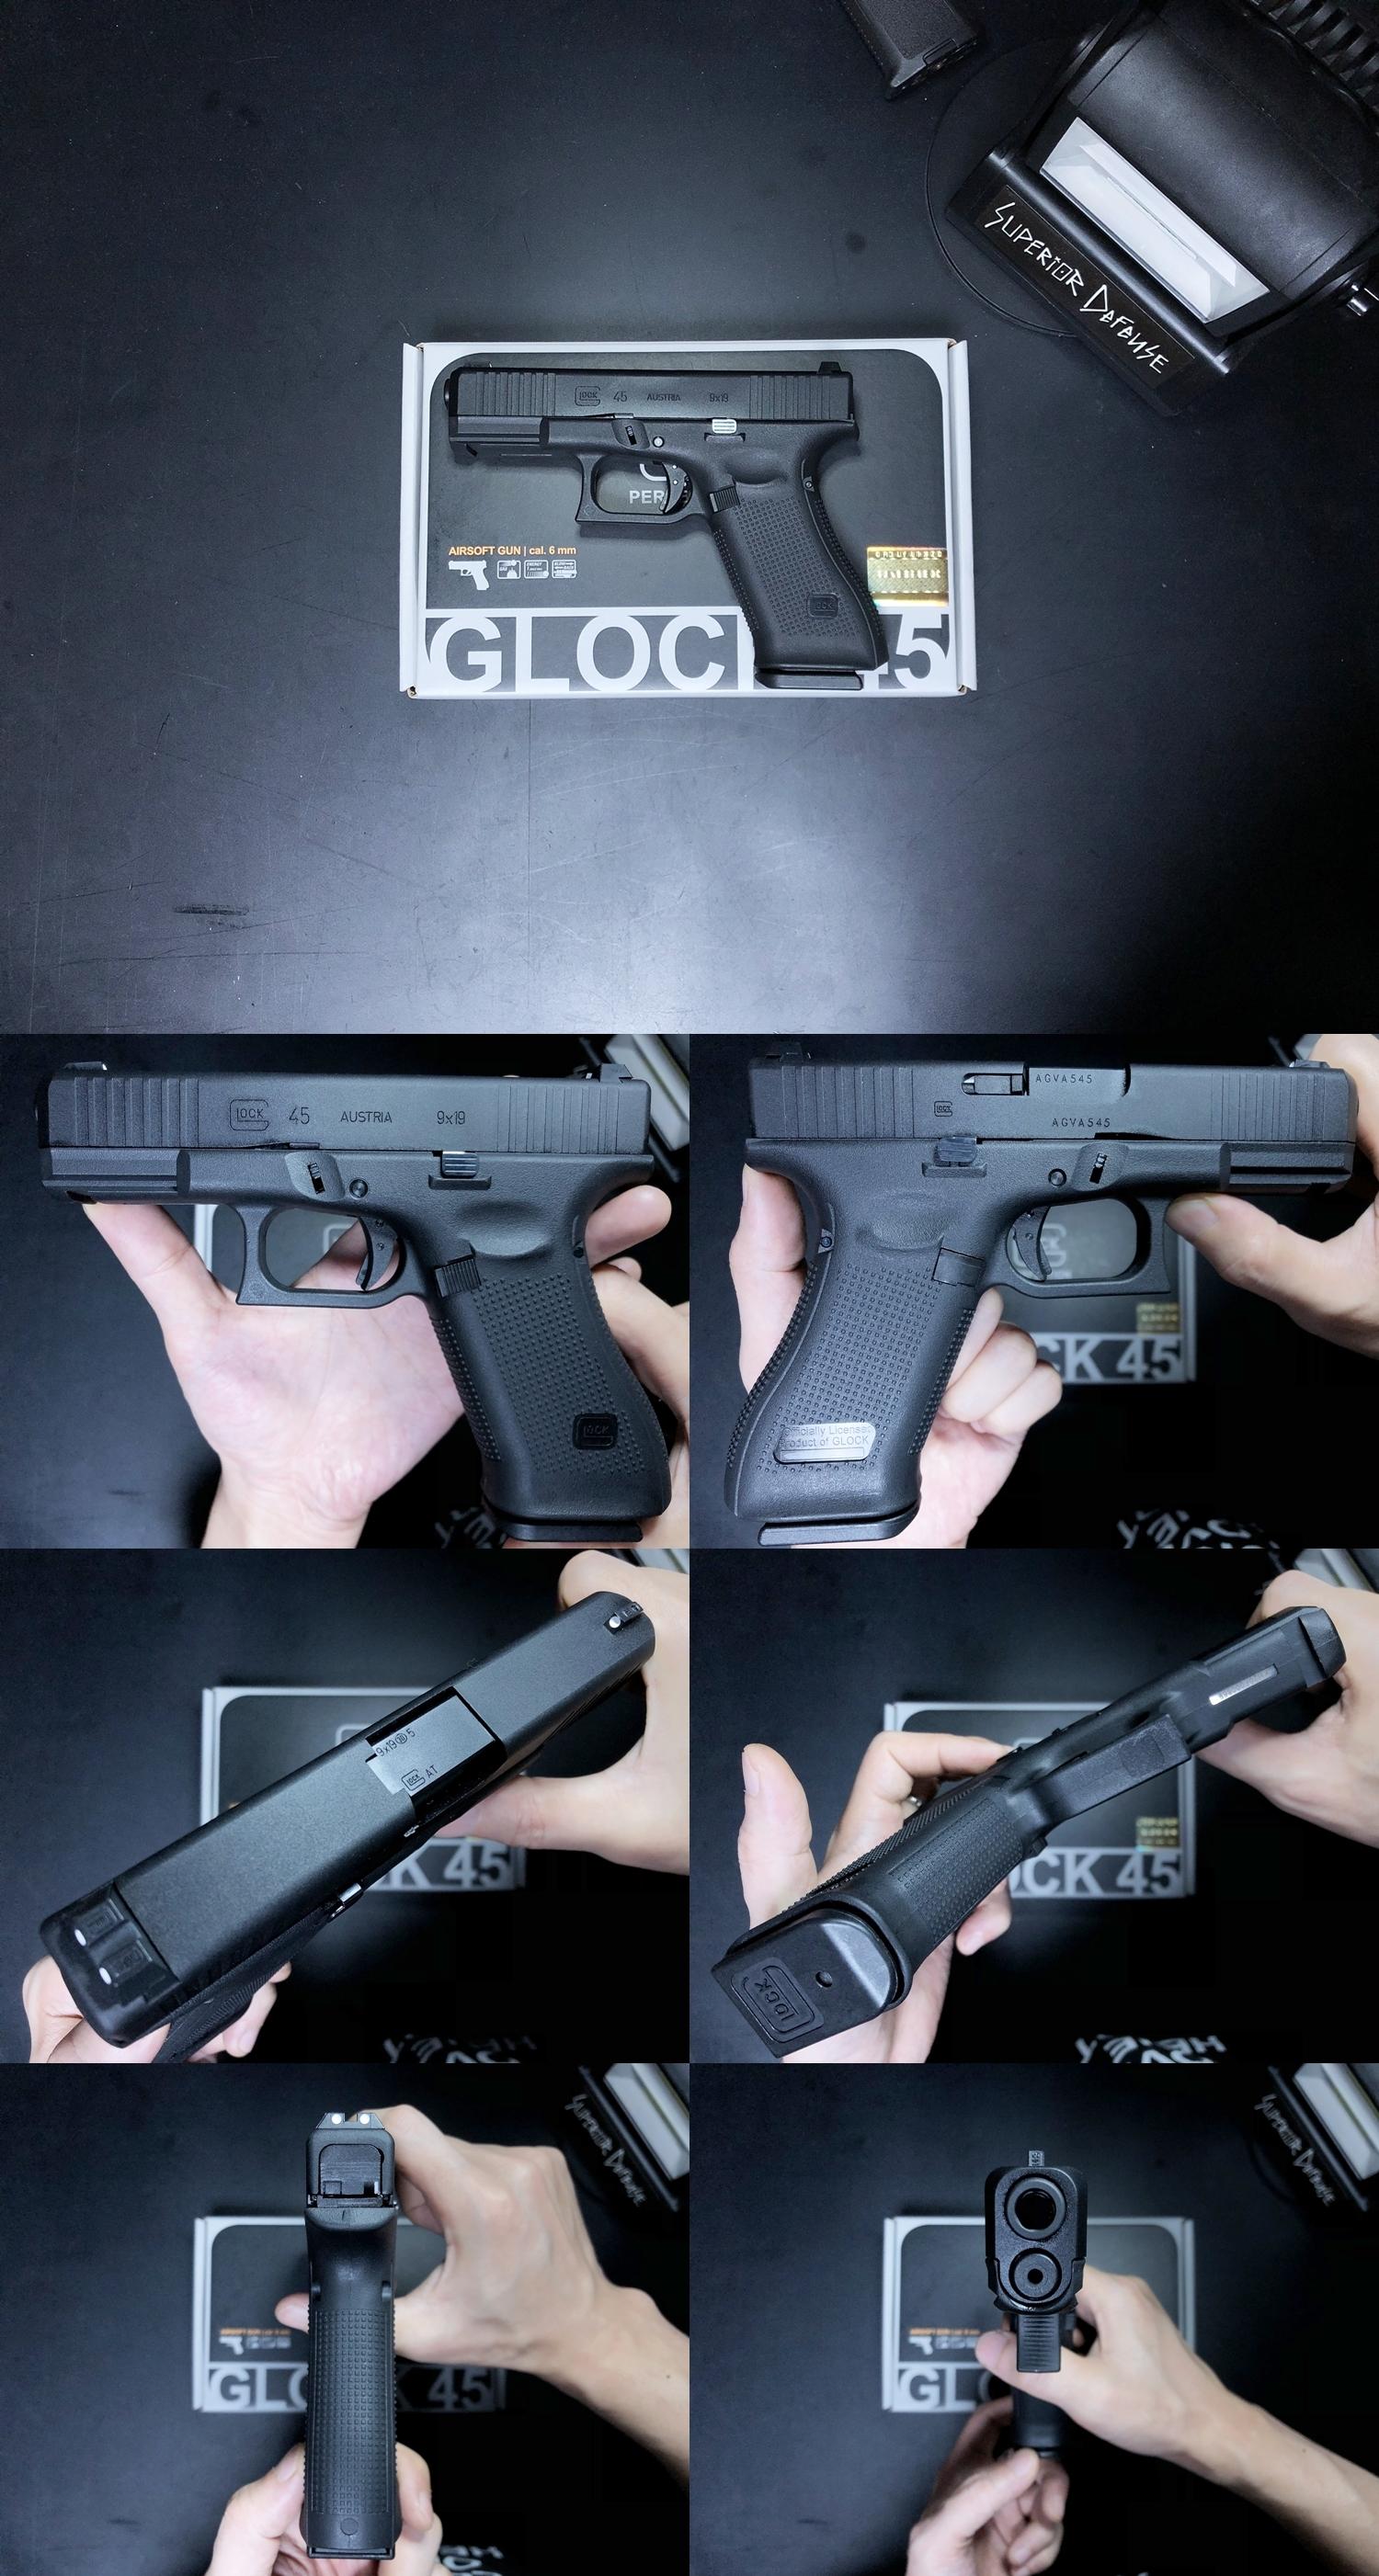 5 UMAREX VFC GLOCK G45 GBB AIRSOFT!! 噂のウマレックス G45 グロック ガスブローバック!! やっと我が家へ着弾 ~ 新品箱出し編!! 購入 開封 初速 計測 検証 比較 通常分解 組立 カスタム レビュー!!